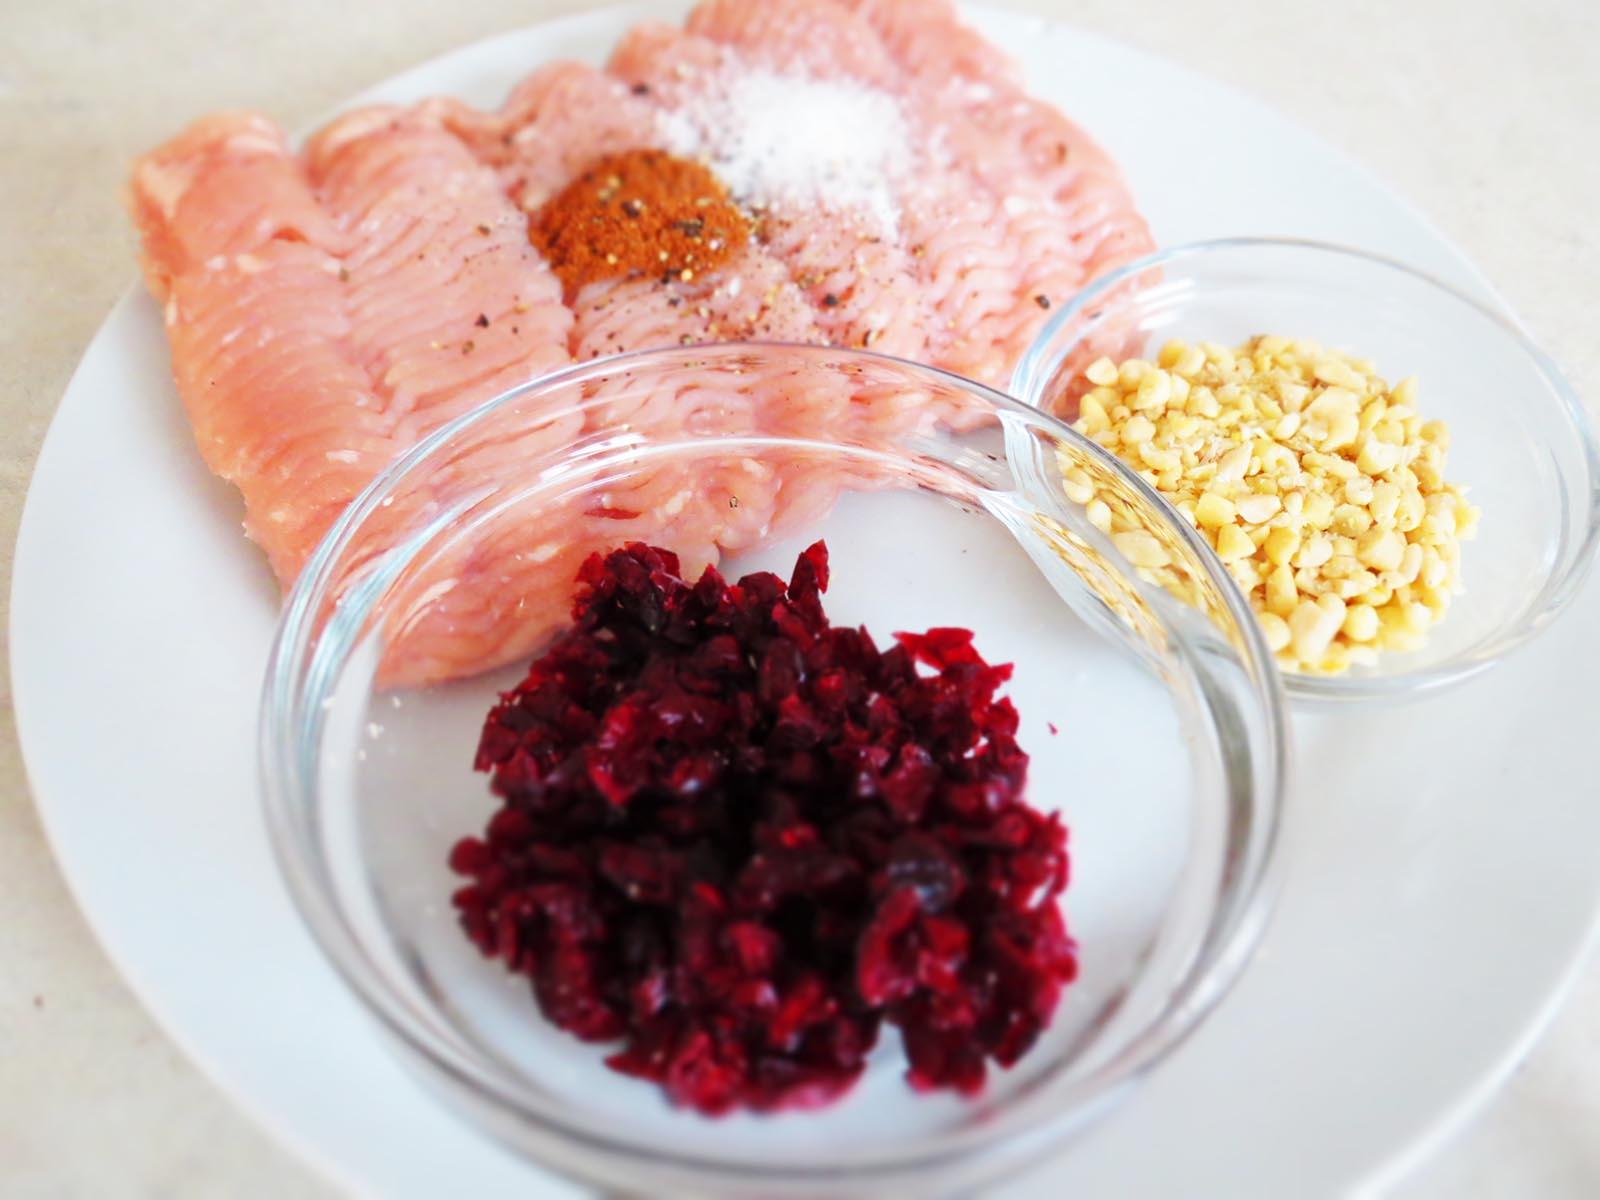 ingredients-for-meatballs